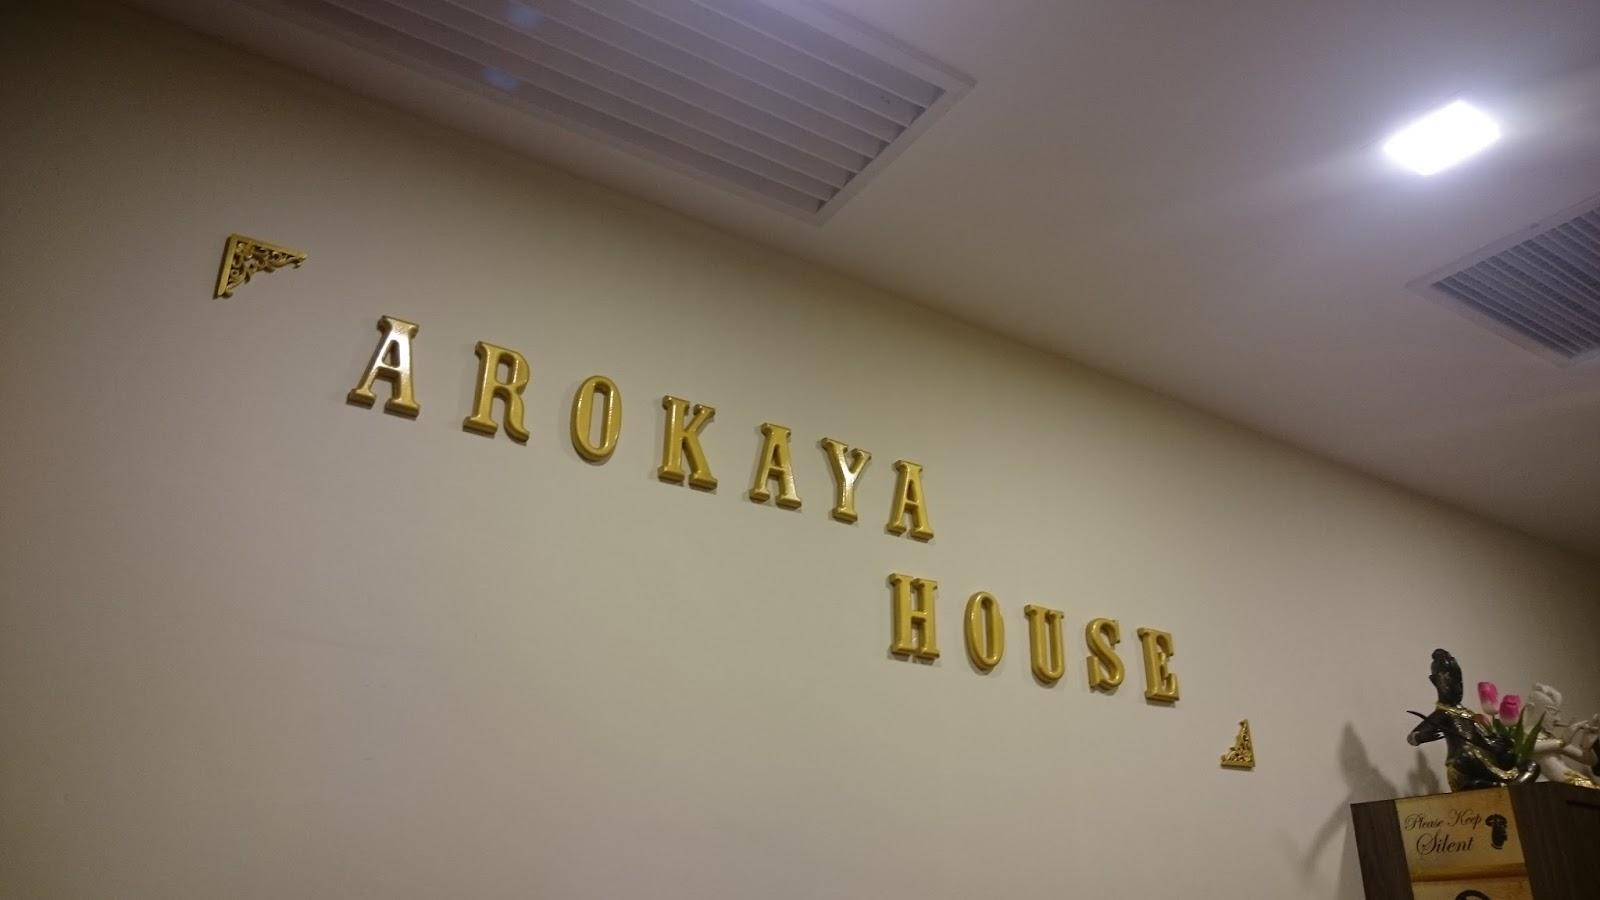 Ainaa Md: Massage Review: Arokaya House at Sunway Putra Mall